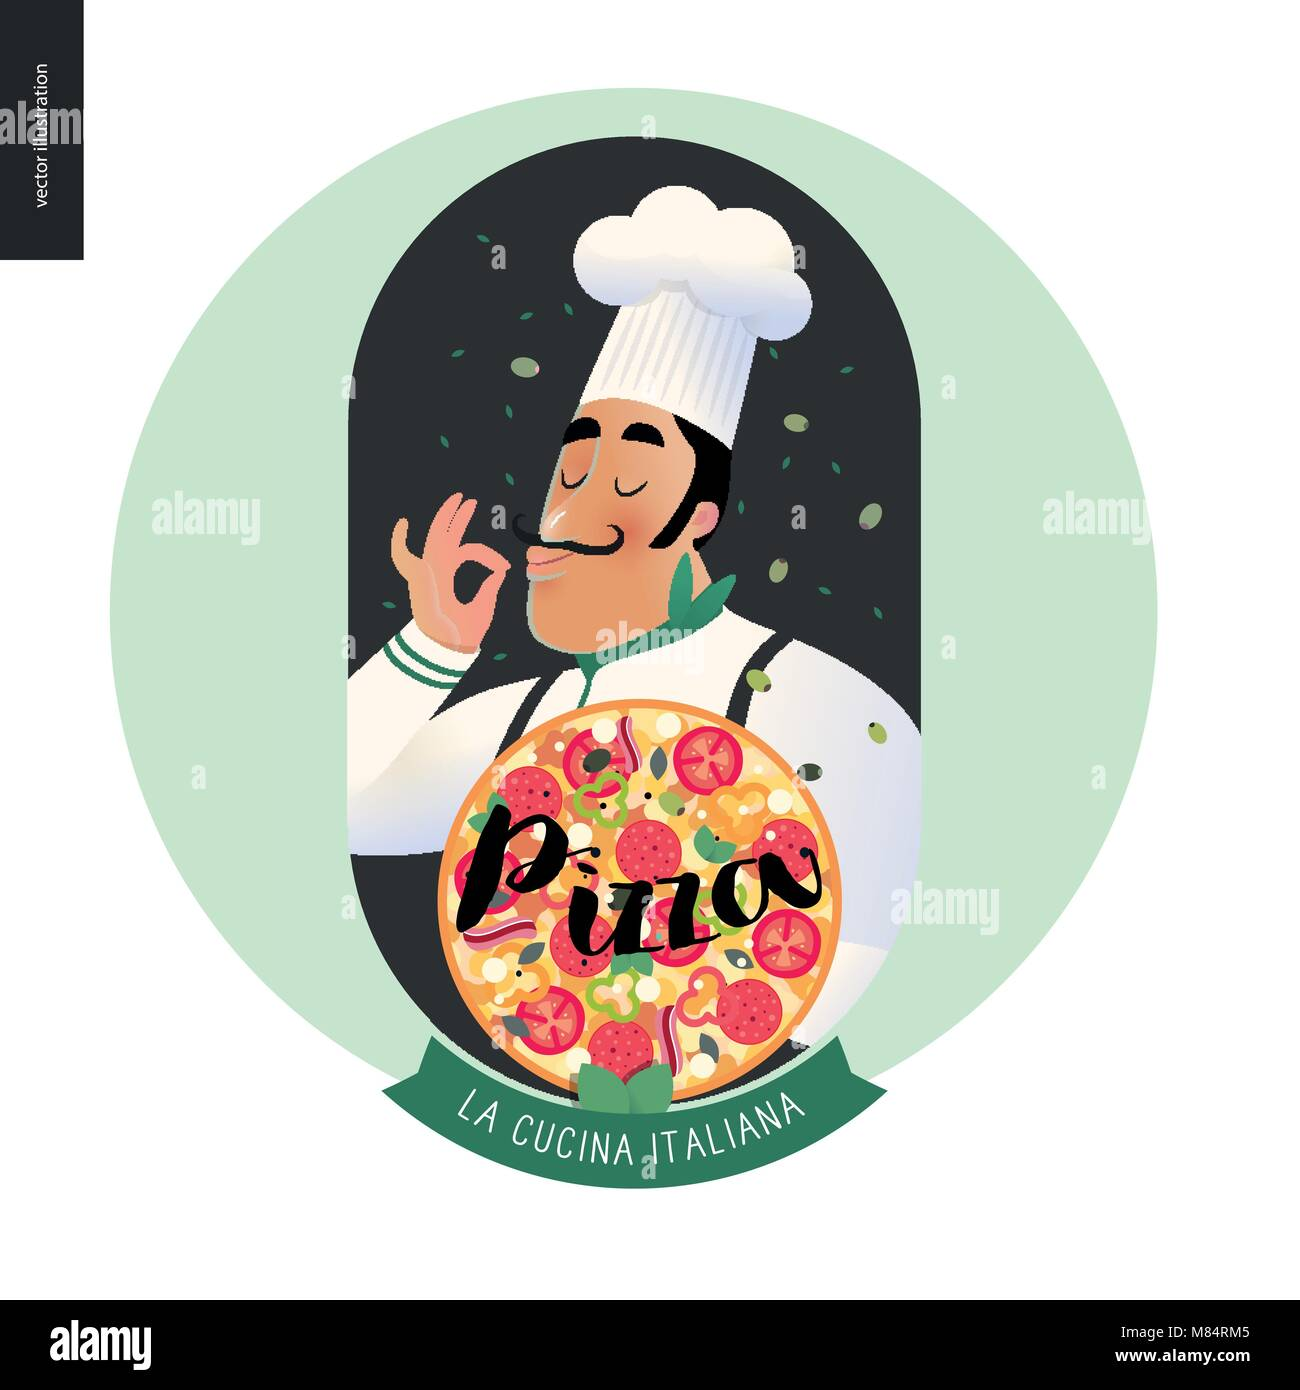 Italian Restaurant Set Italian Restaurant Logo With A Cook Enjoing Stock Vector Image Art Alamy